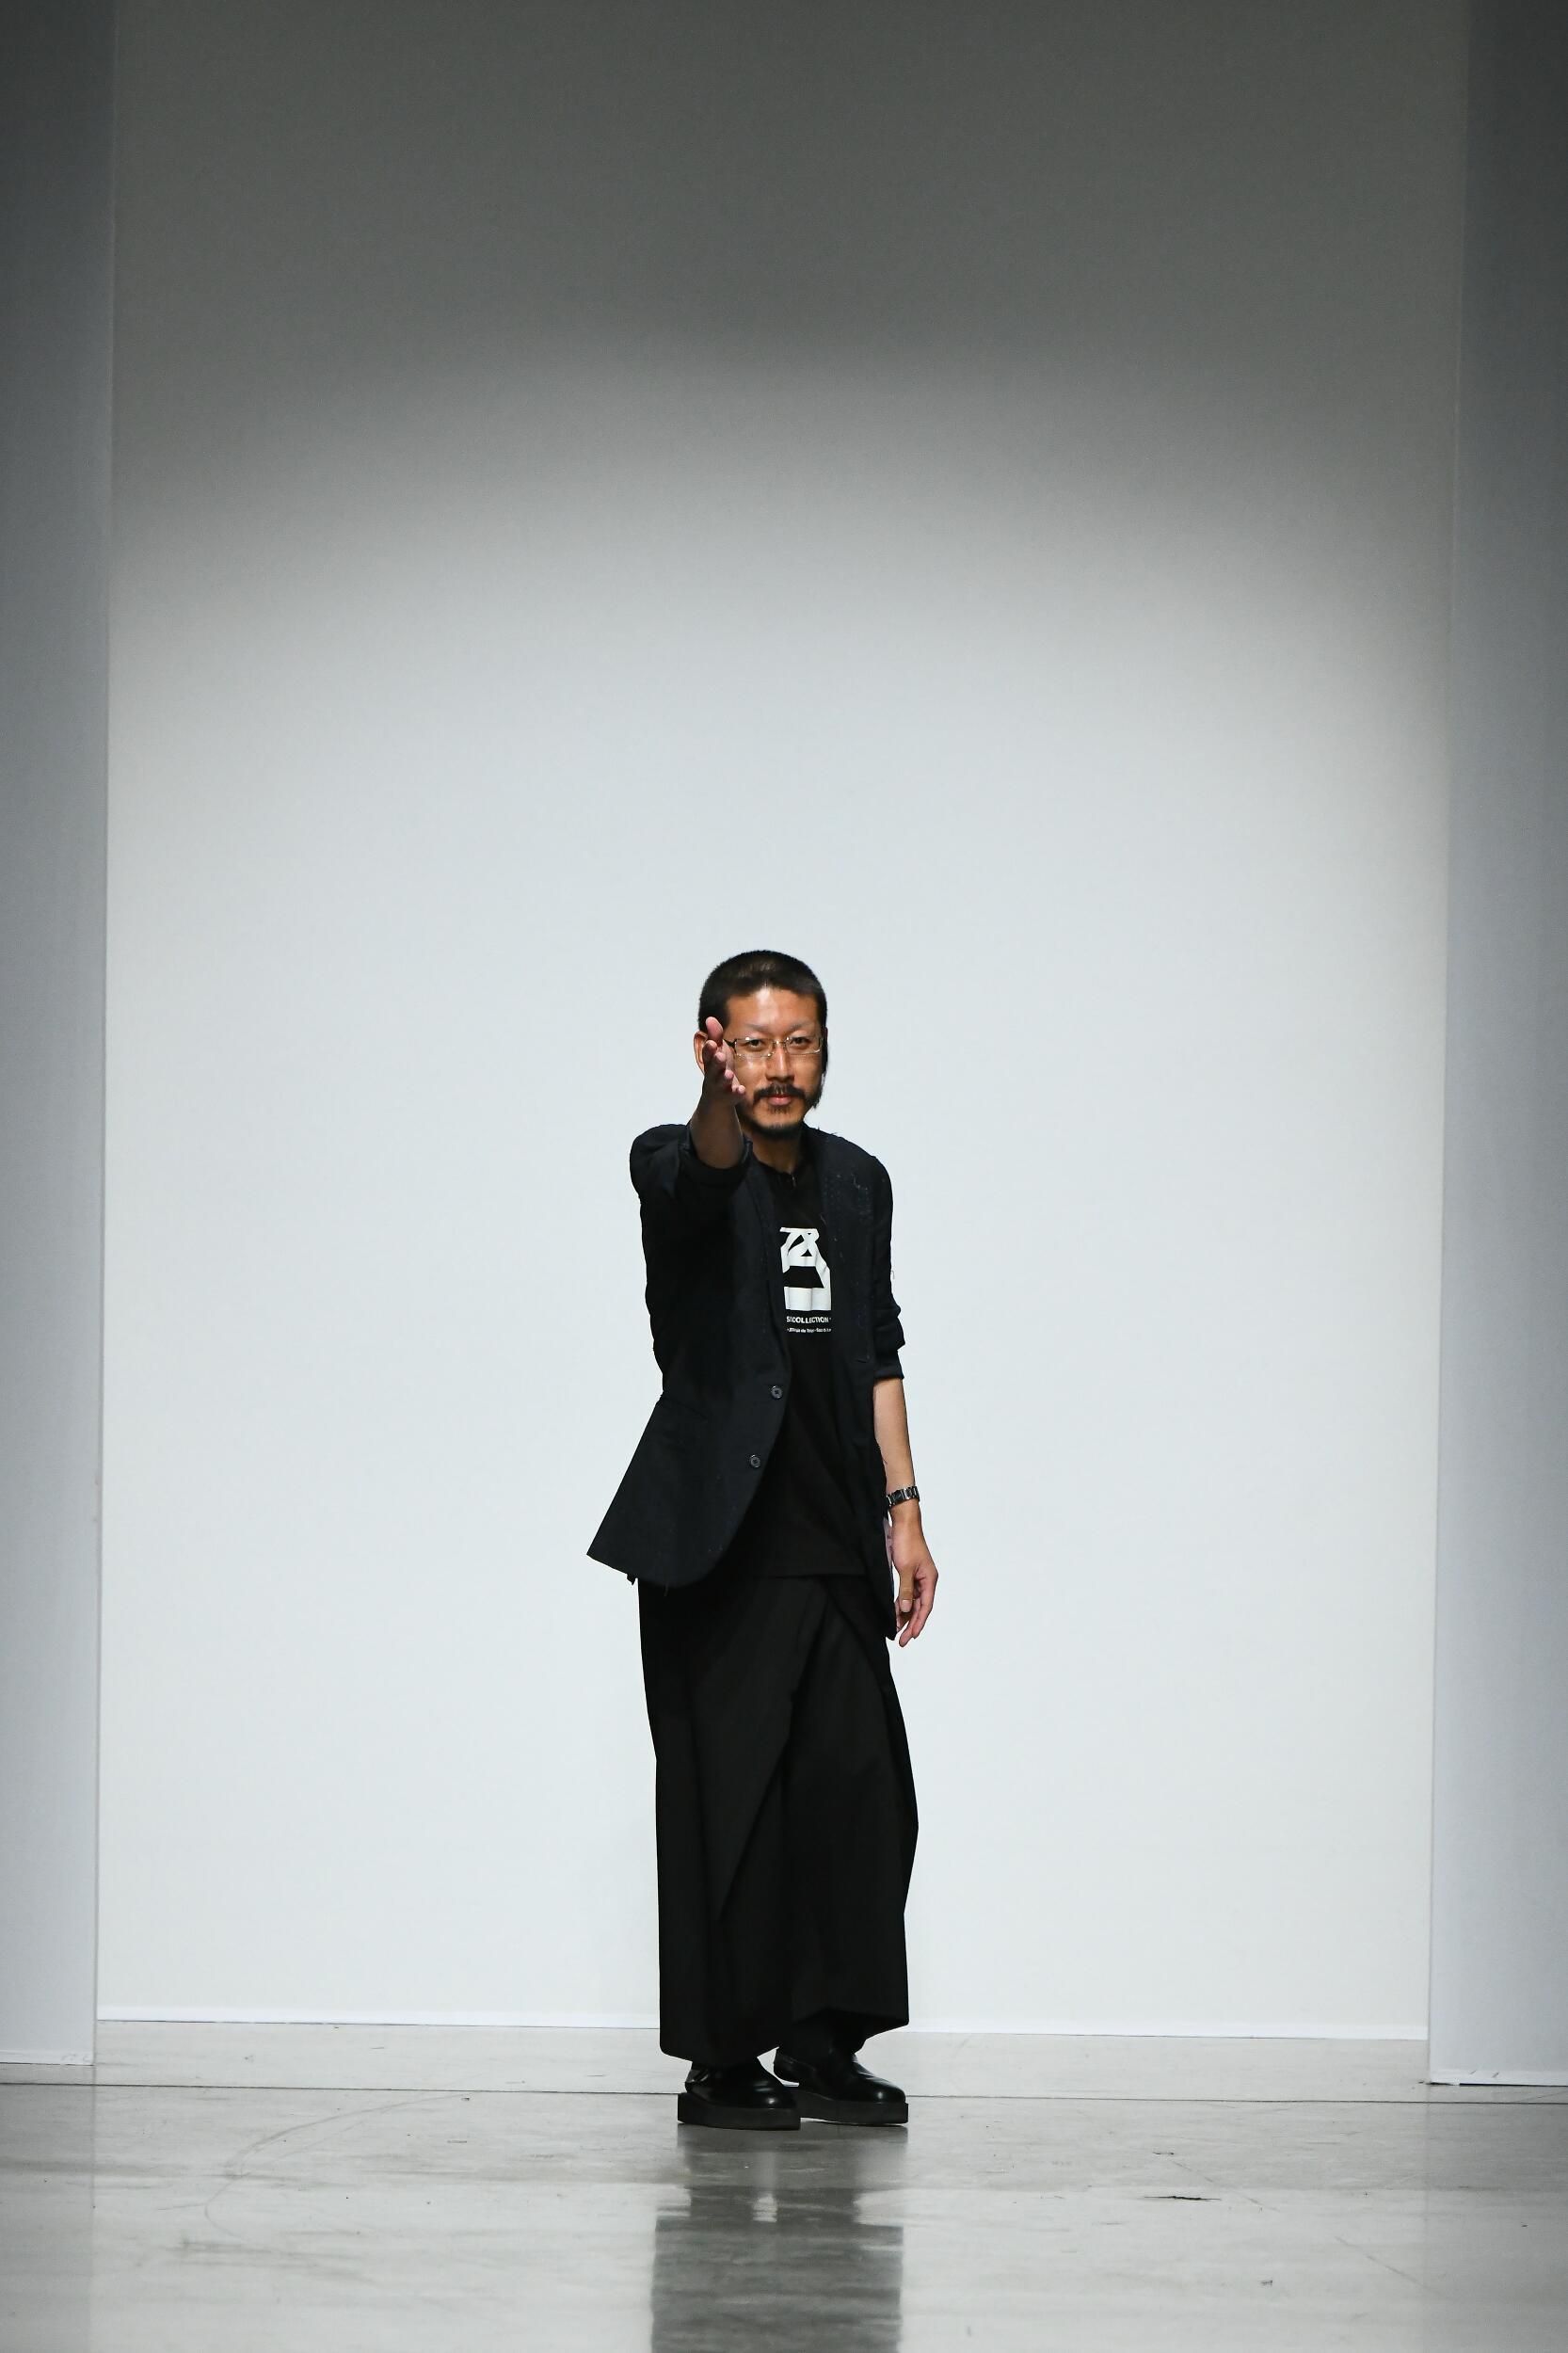 Kunihiko Morinaga